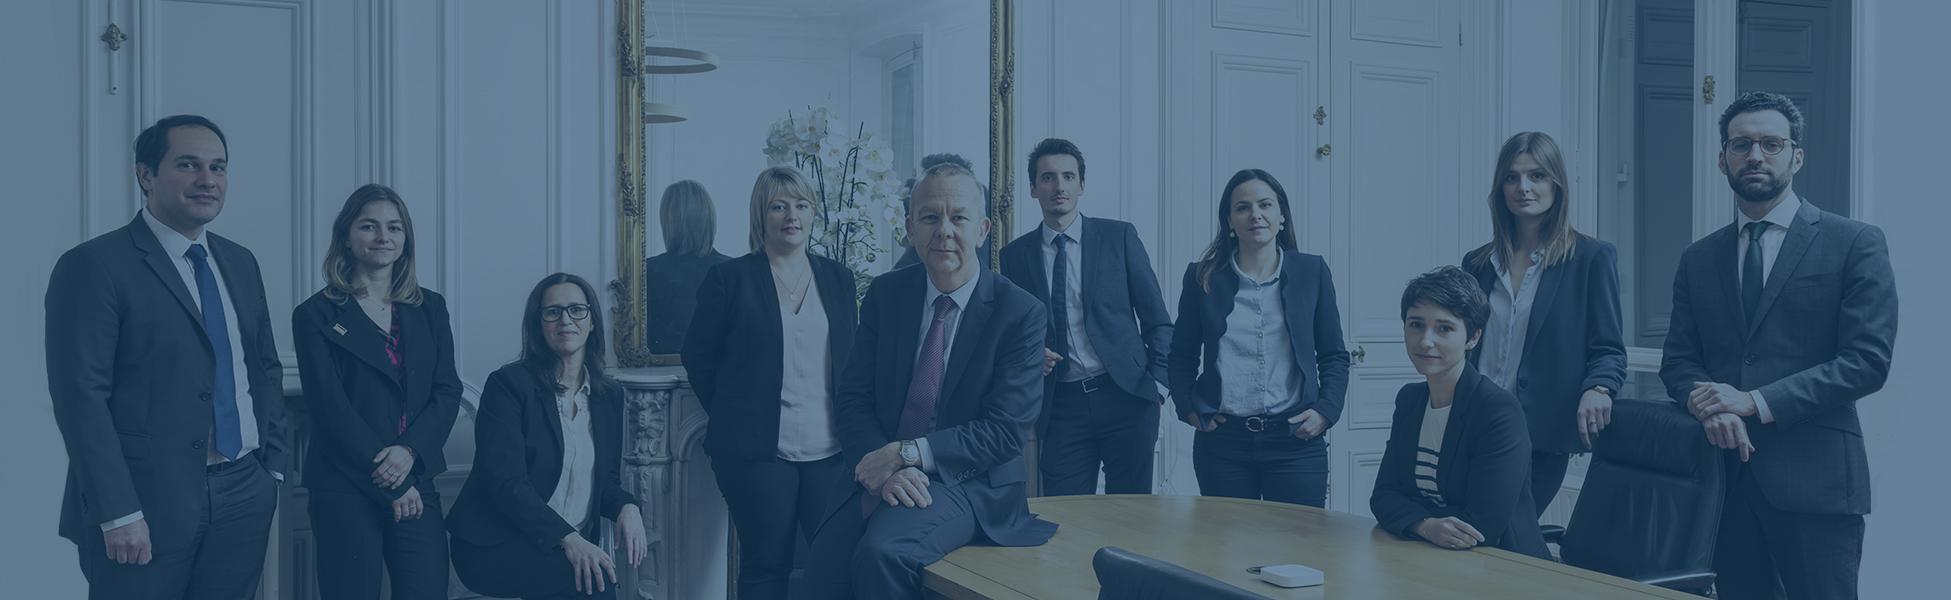 Sevestre Associés - Avocats en Droit Fiscal